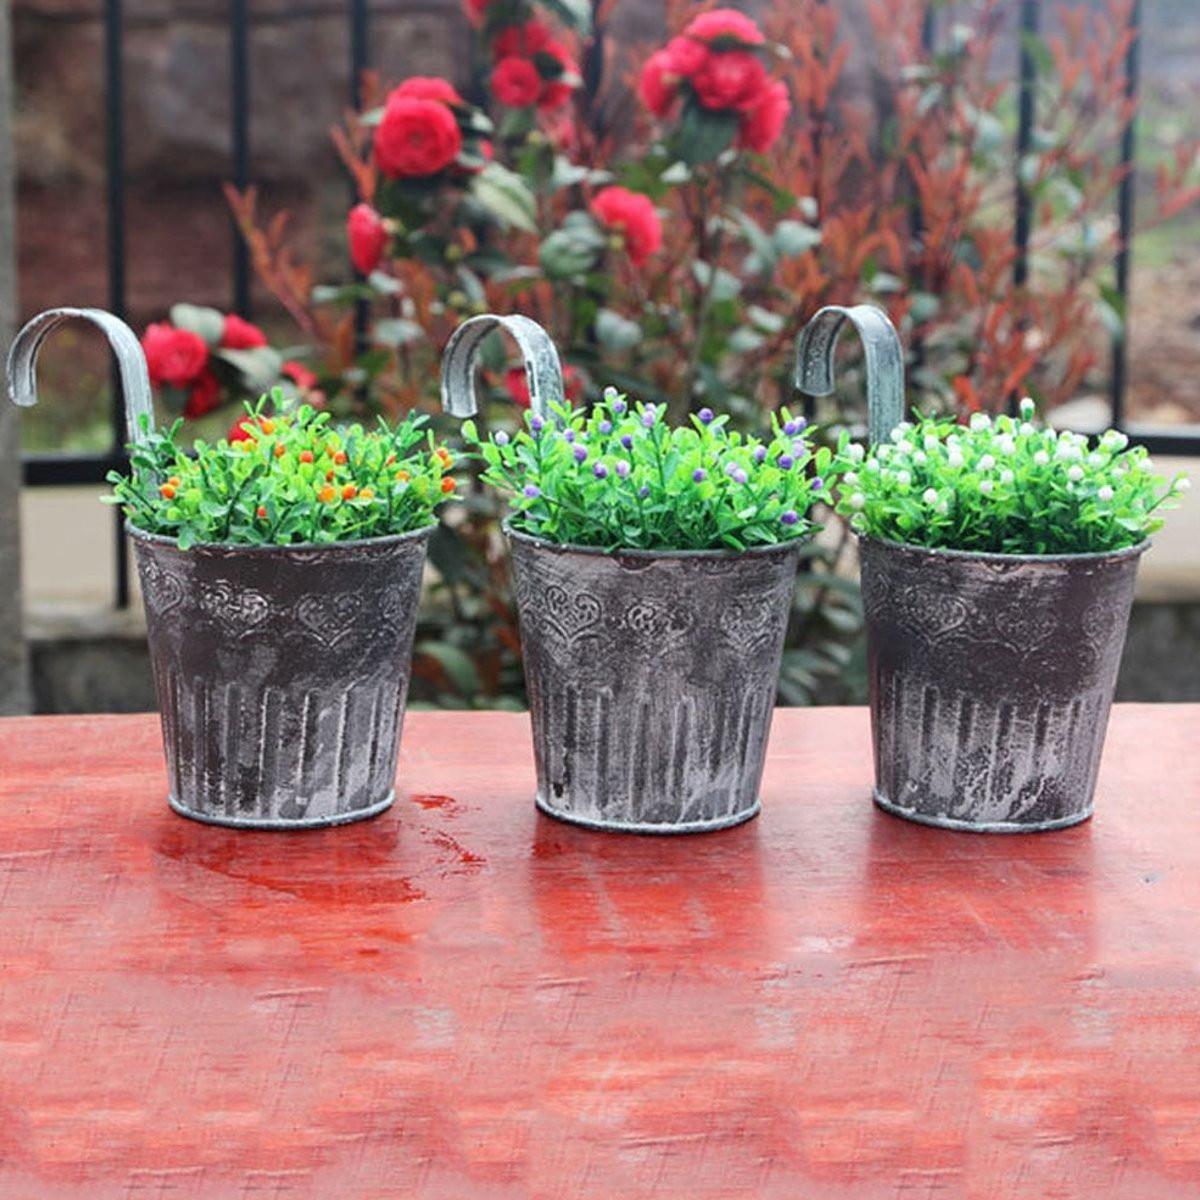 Vintage Style Metal Hanging Planter Pot Zinc Garden Plant Flower ...